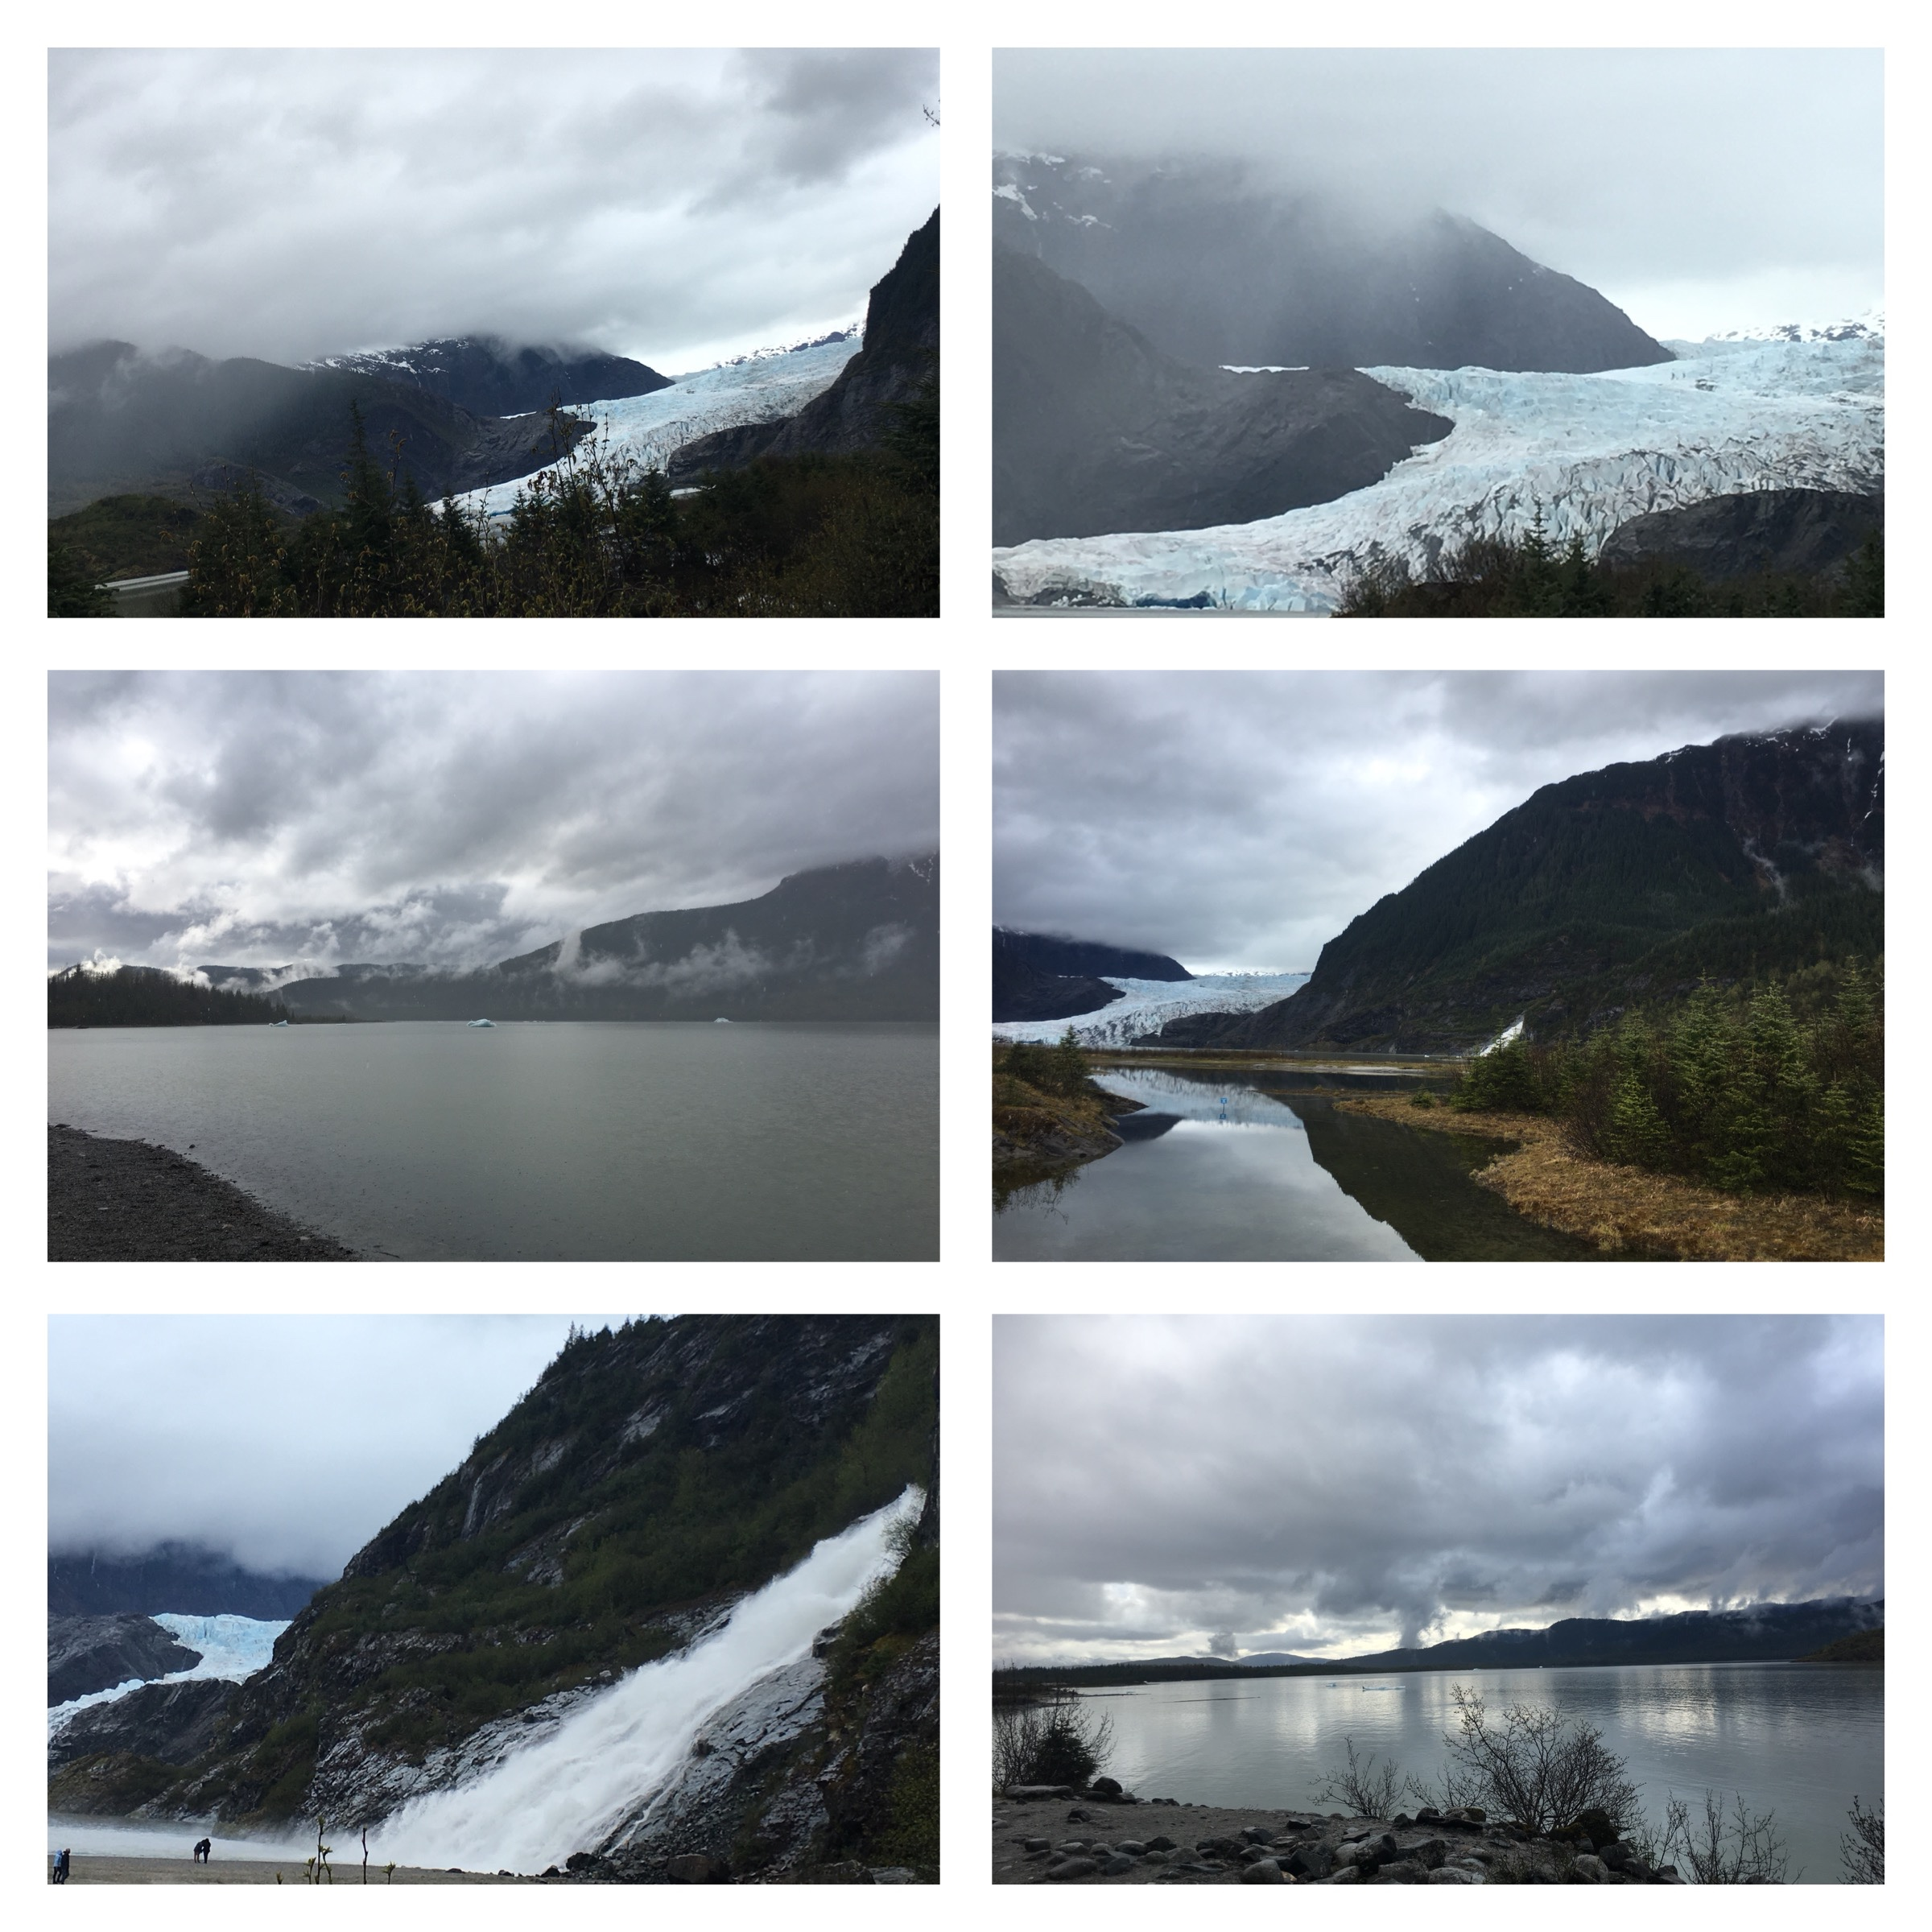 Our Alaska Cruise: Mendenhall Glacier